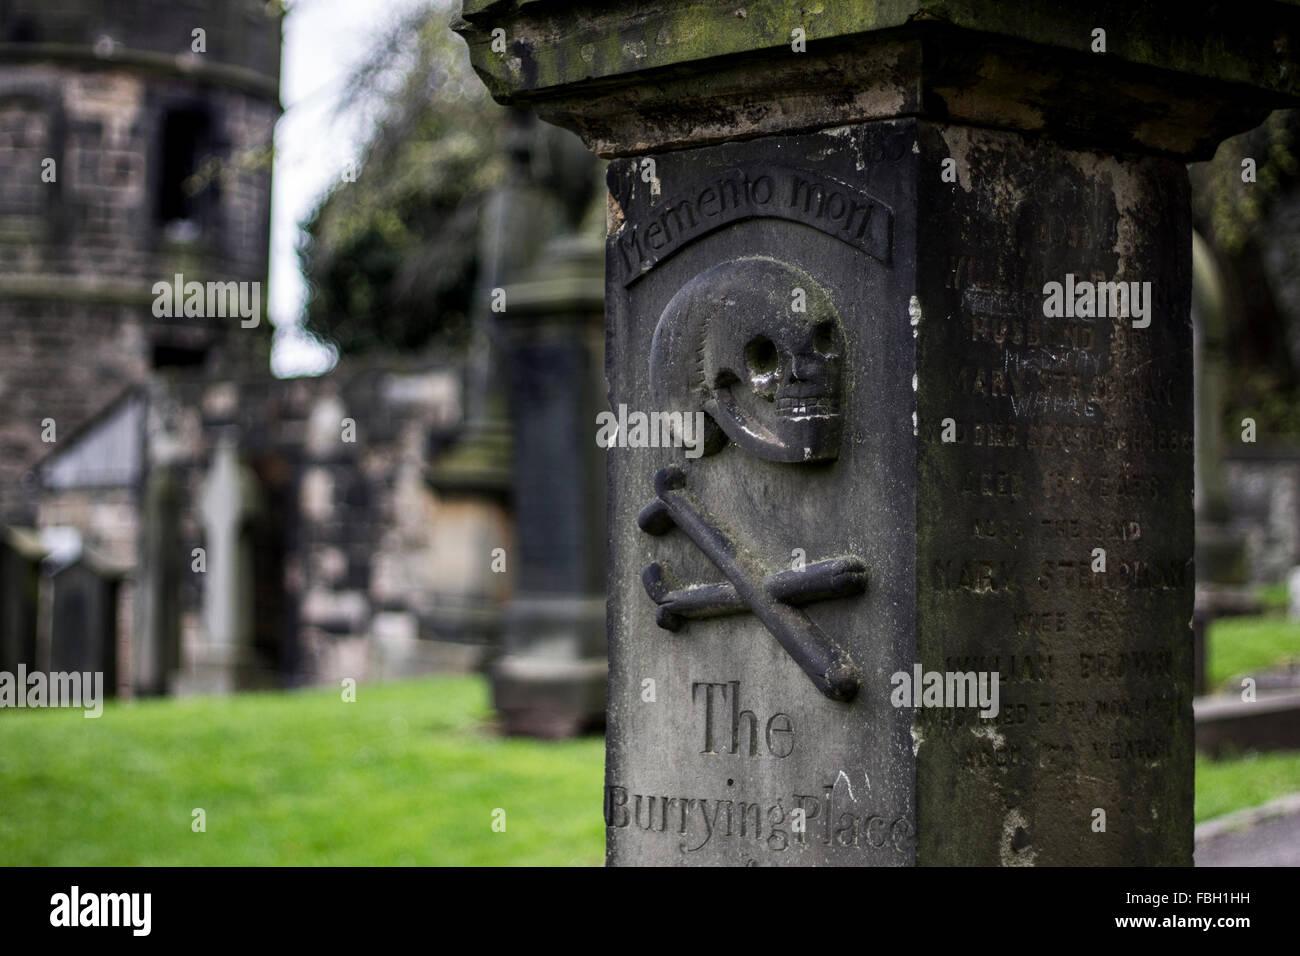 Grave Marker - Stock Image